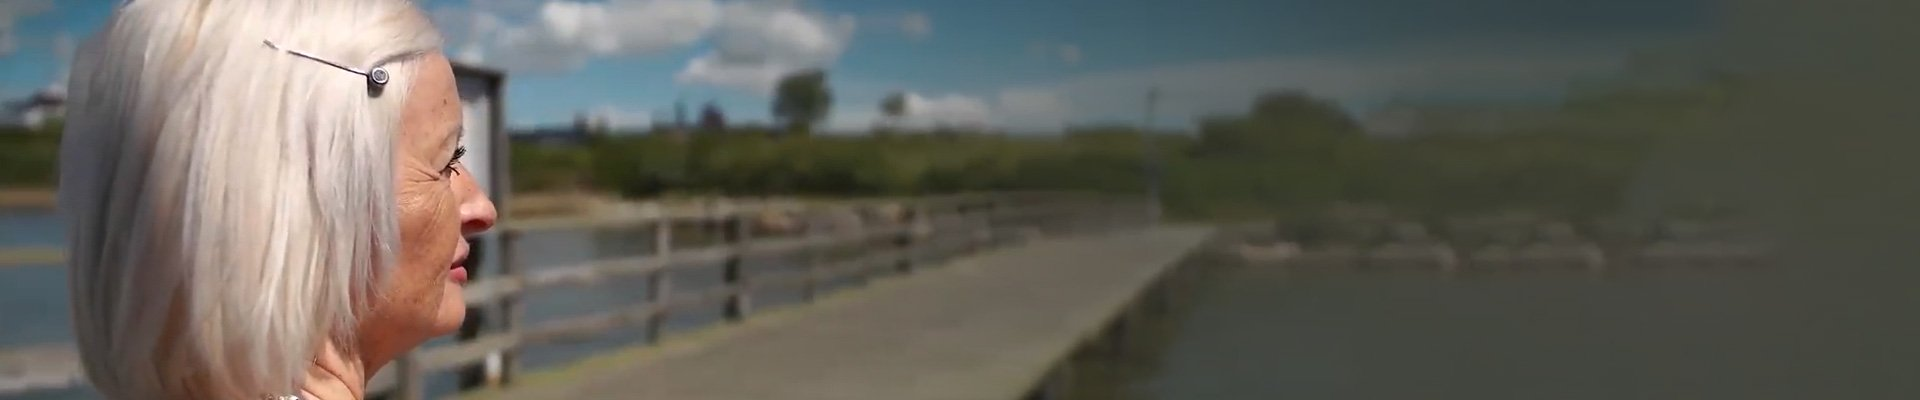 1920x400-video-testimonial-lone